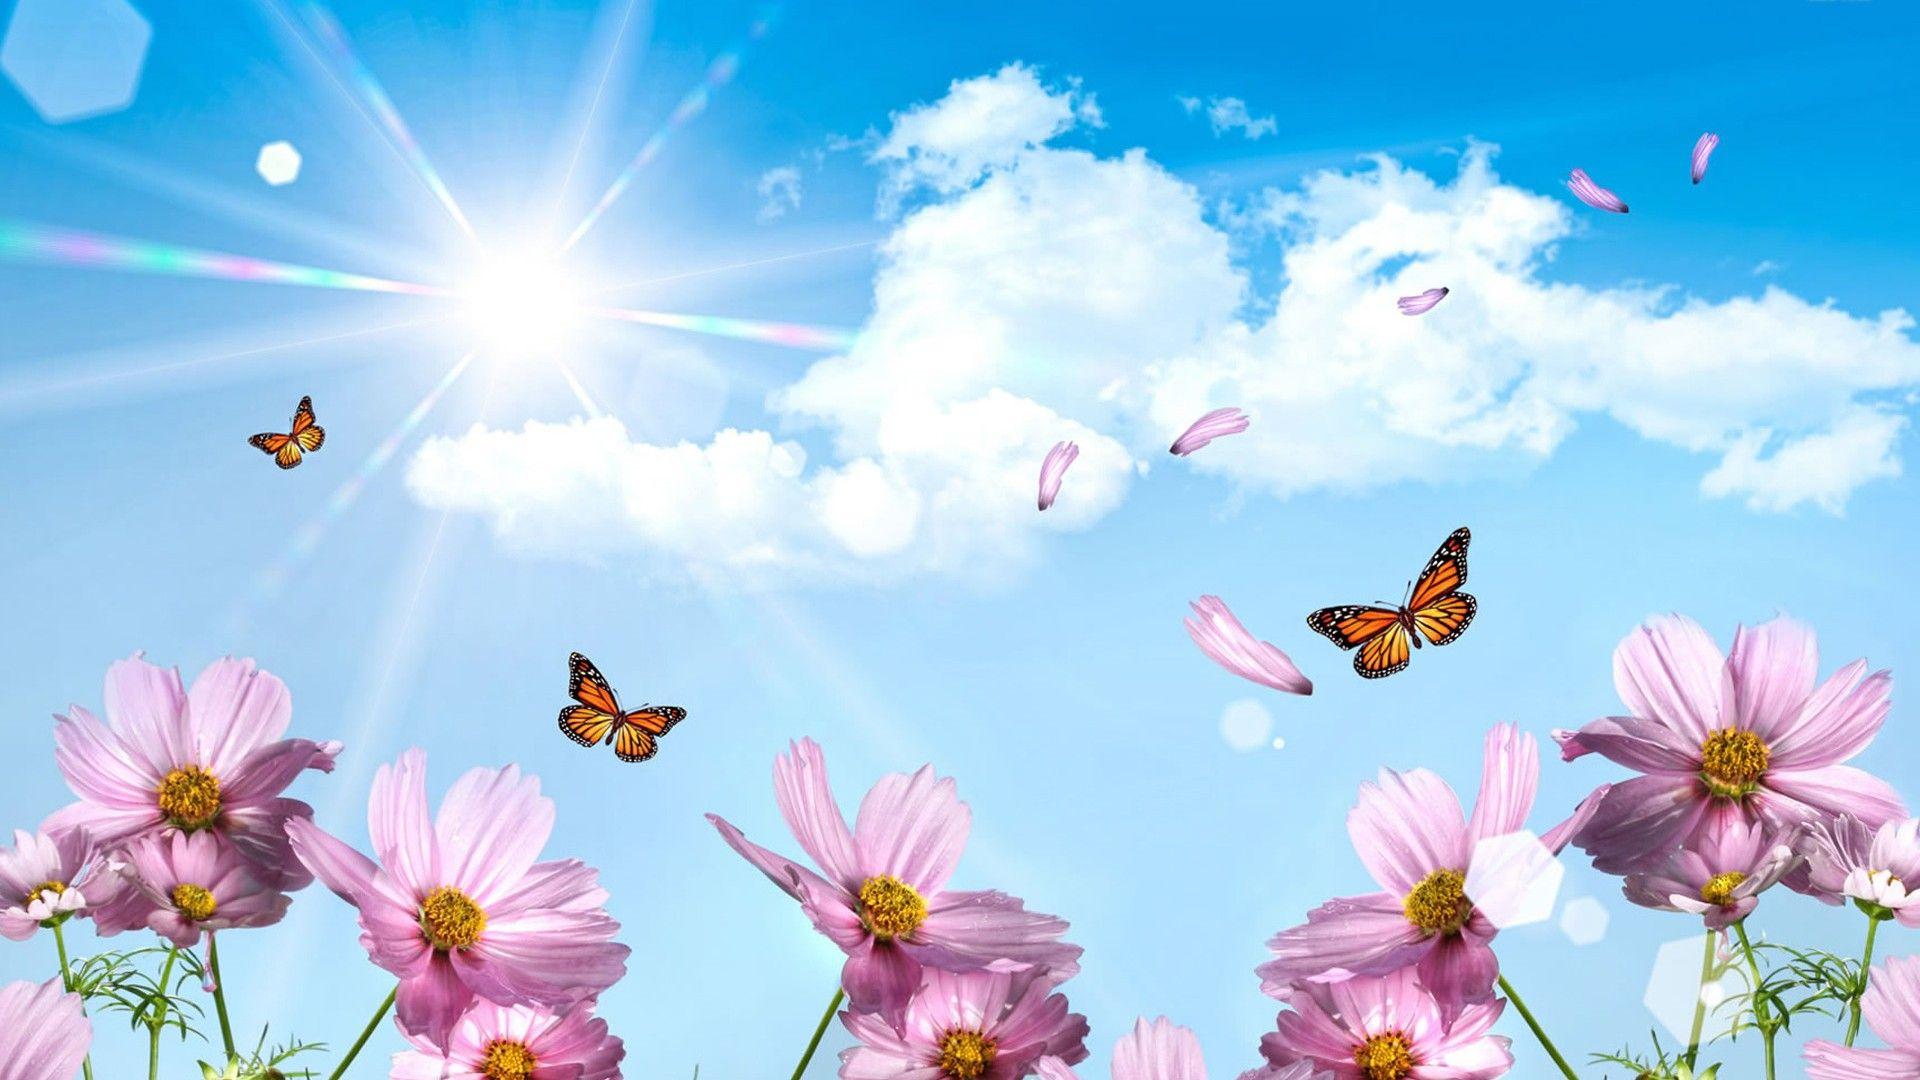 Wallpaper Hd Hello Spring 2021 Live Wallpaper Hd Spring Wallpaper Butterfly Wallpaper Desktop Wallpapers Backgrounds